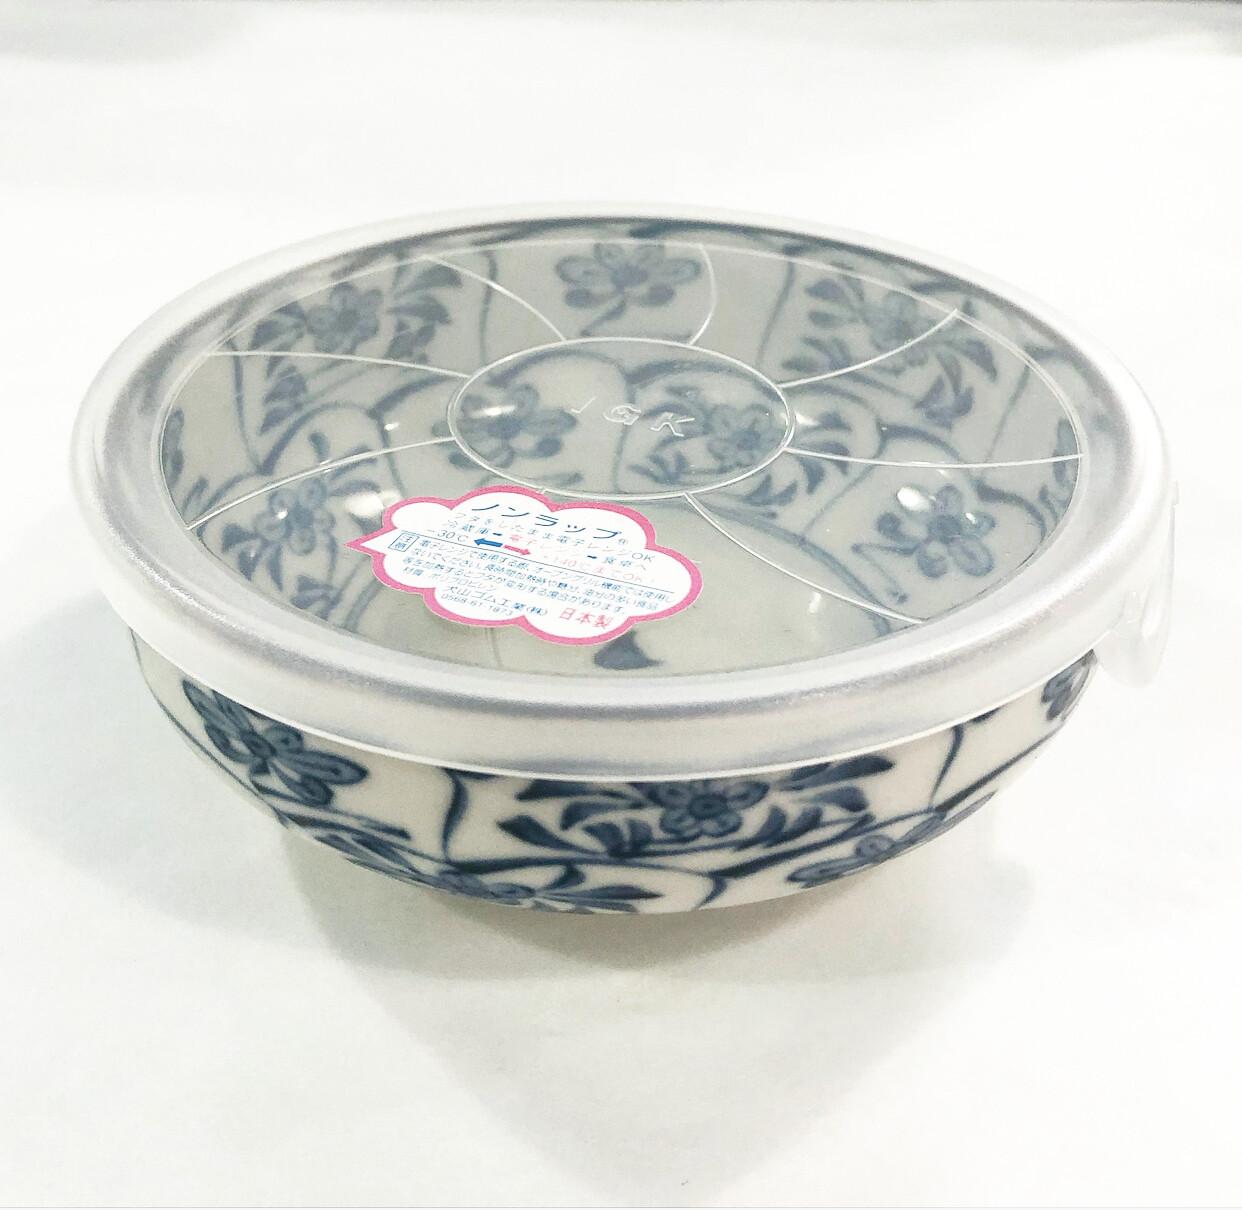 CONCEPT JAPAN 706-6 Nazuna medium bowl/ dia 12.5 x 4cm